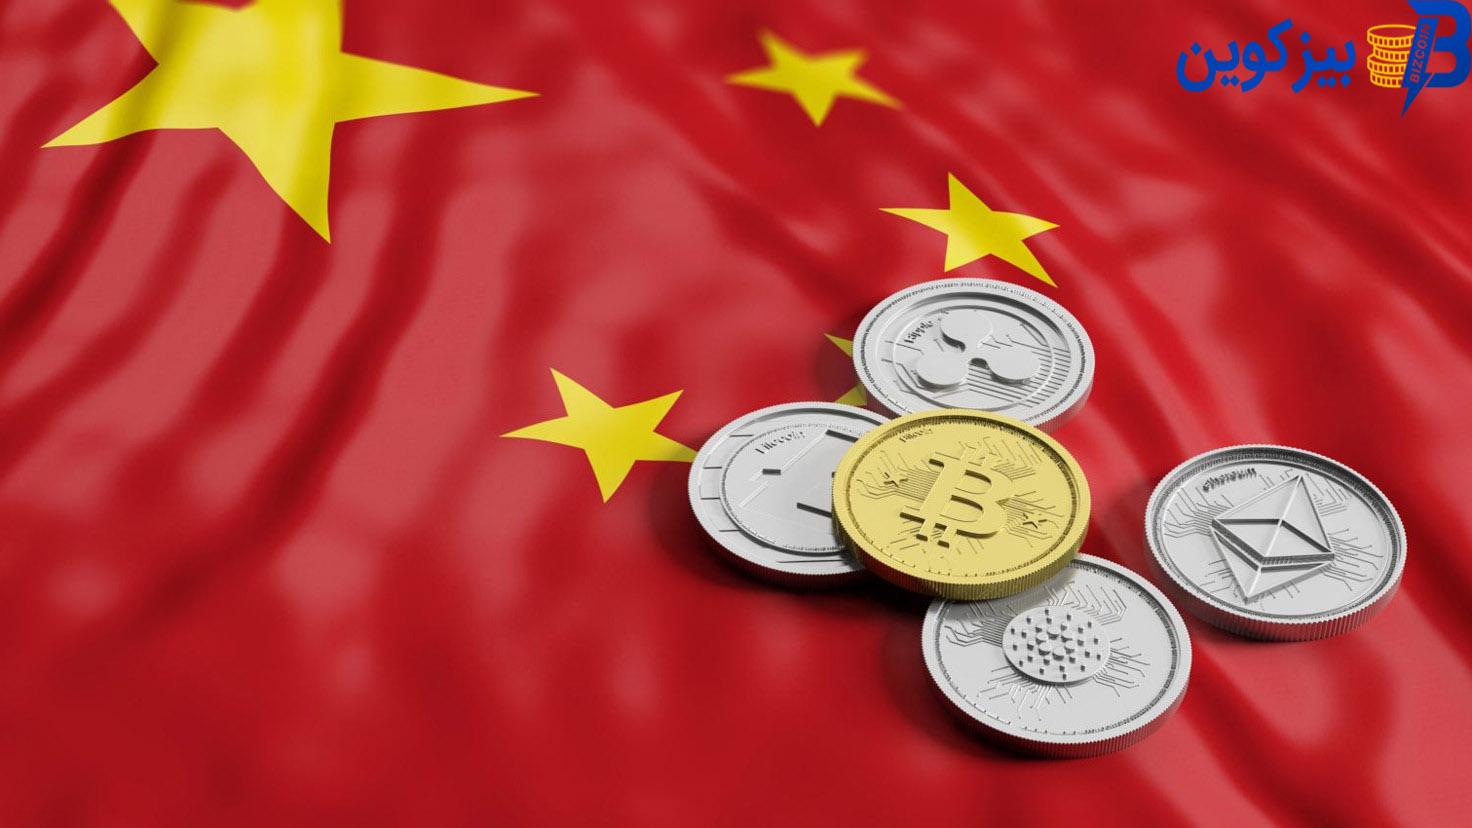 China National Digital Currency 1 چین به کارمندان دولتی از ماه آینده ارز دیجیتال ملی پرداخت می کند!